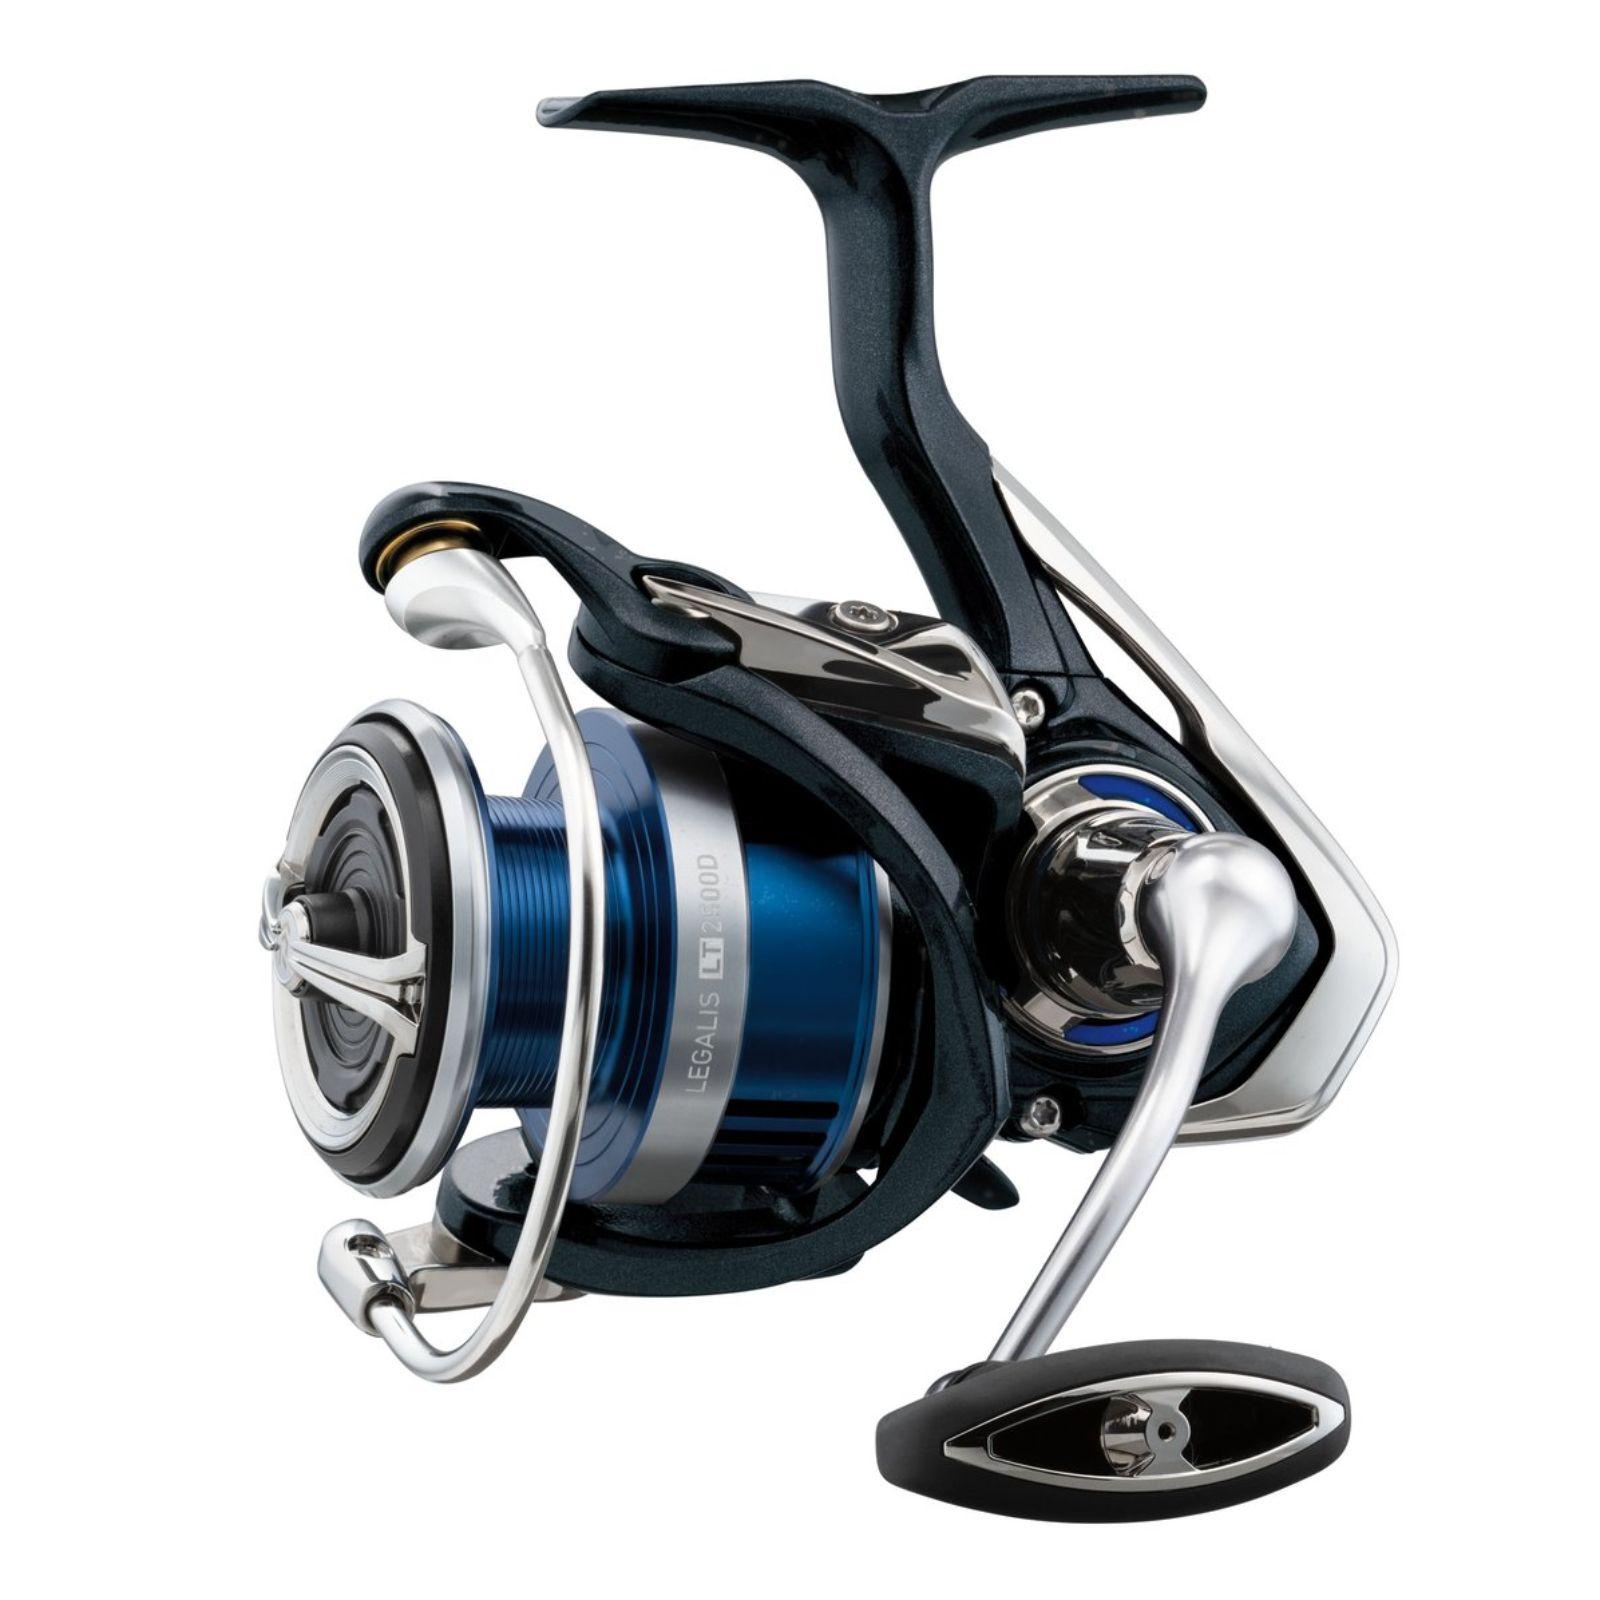 Daiwa Legalis LT 5000D-C Spinning Reel